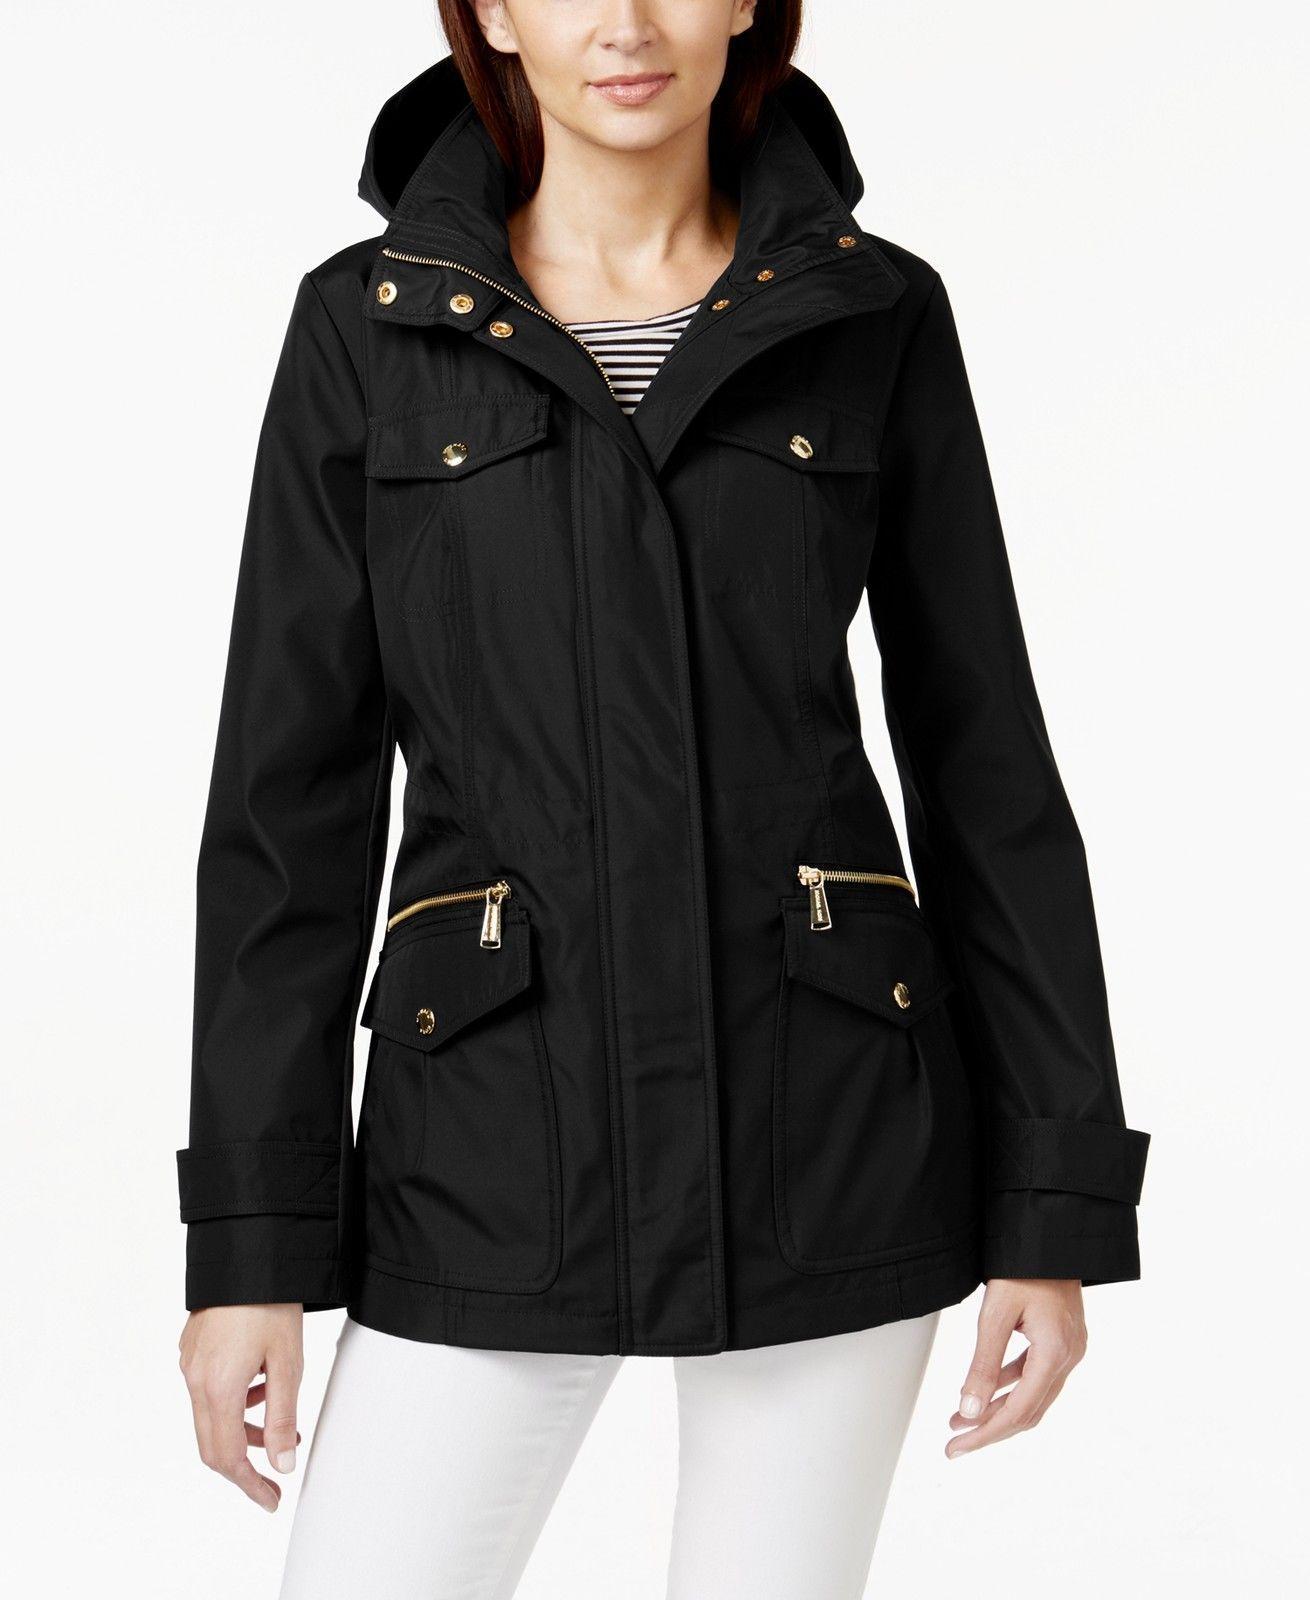 44df8a00fe4 MICHAEL Michael Kors Petite Hooded Anorak Women s Jacket Pre-owned MSRP  180